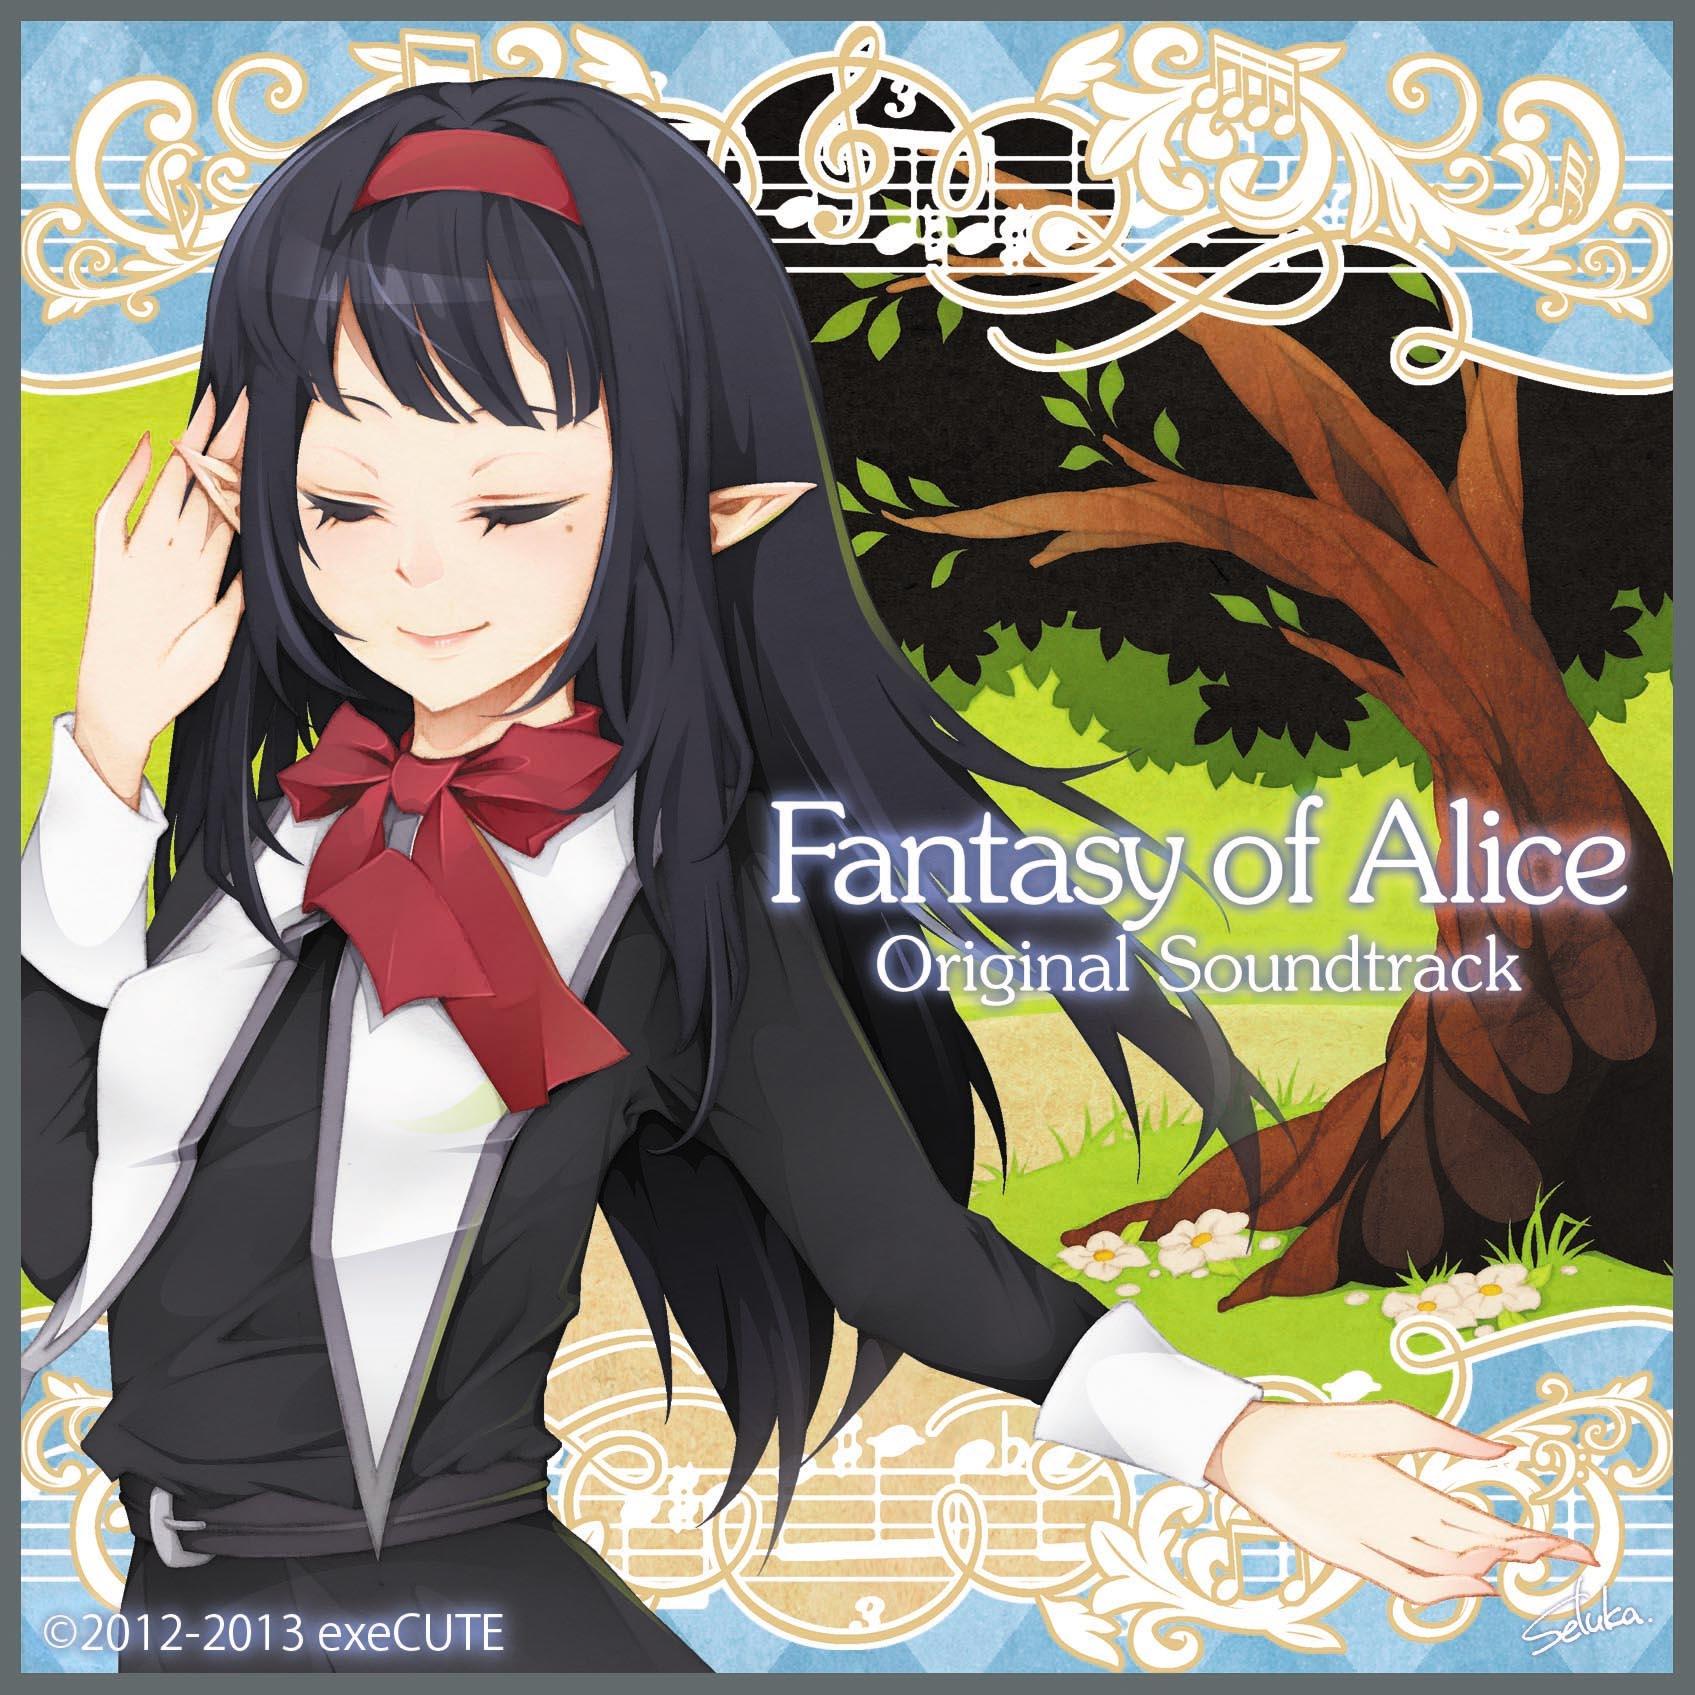 Fantasy of Alice OriginalSoundtrackのサンプル1